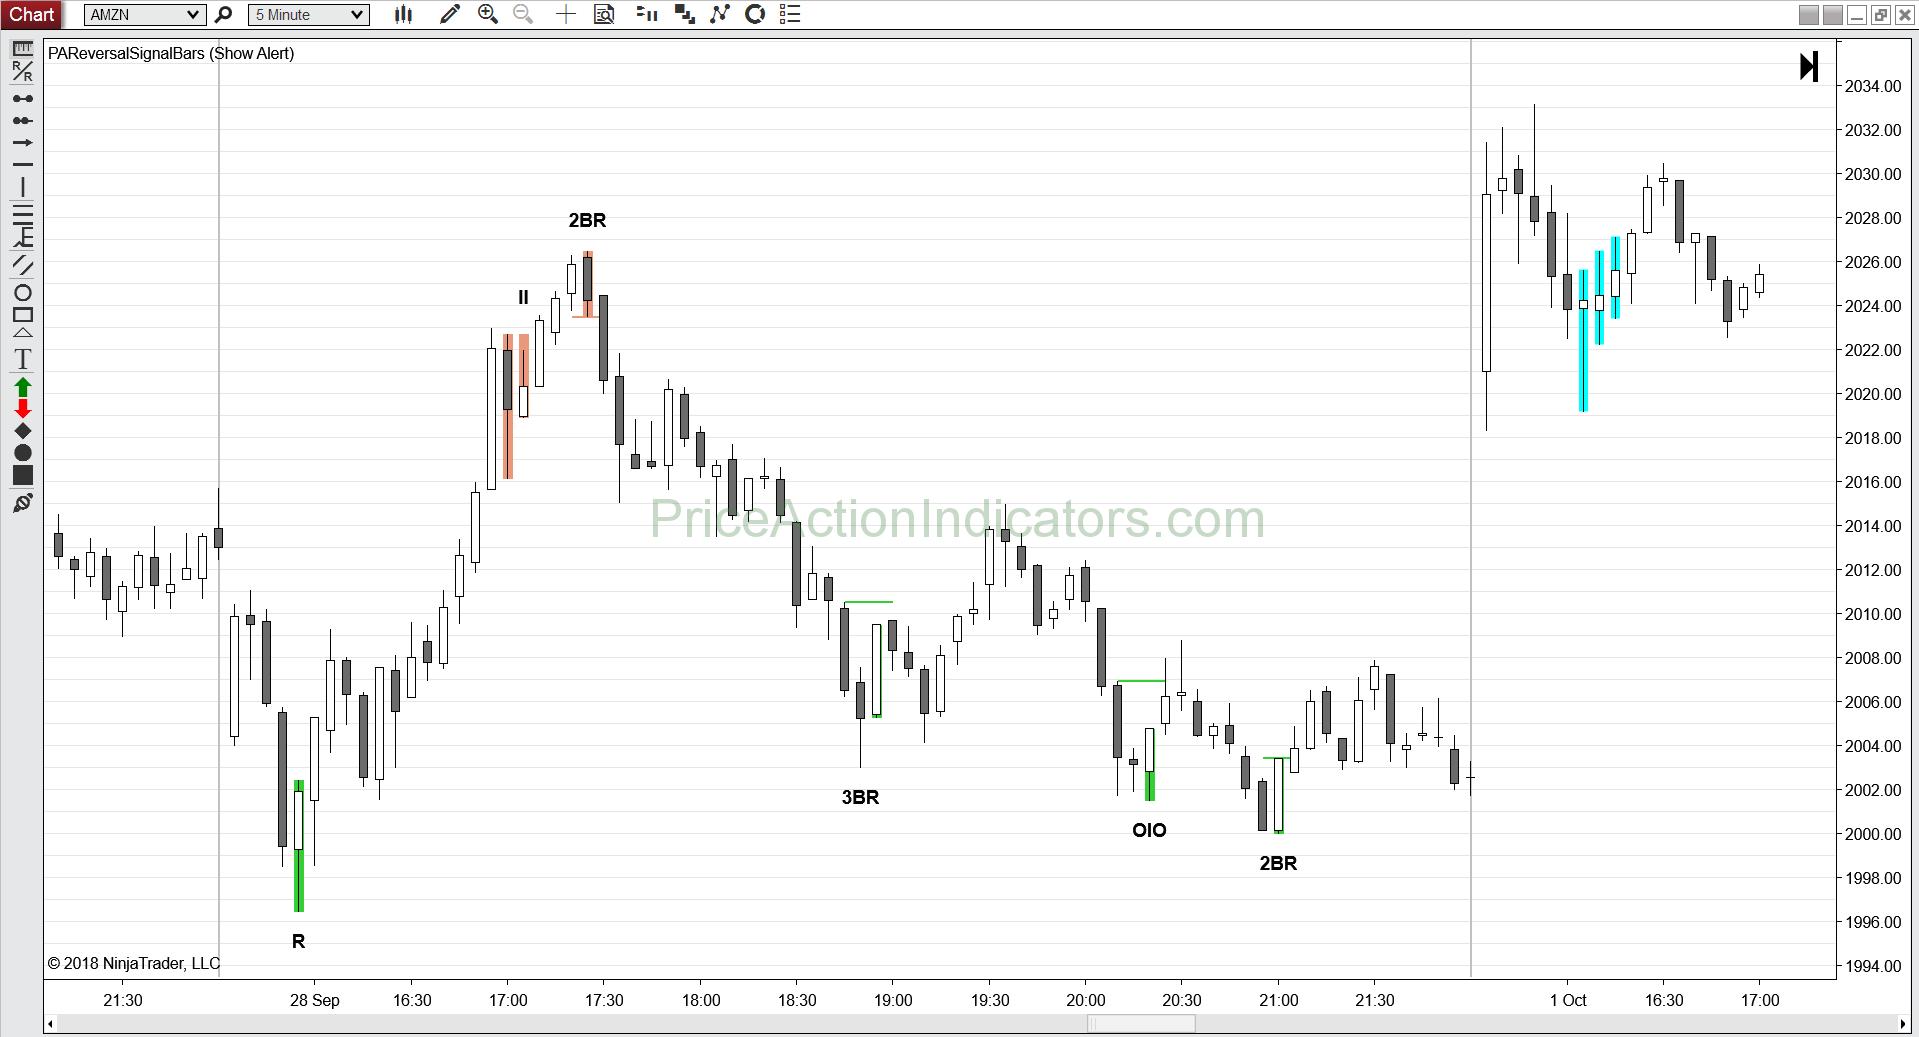 Reversal Signal Bars – Price Action Indicators